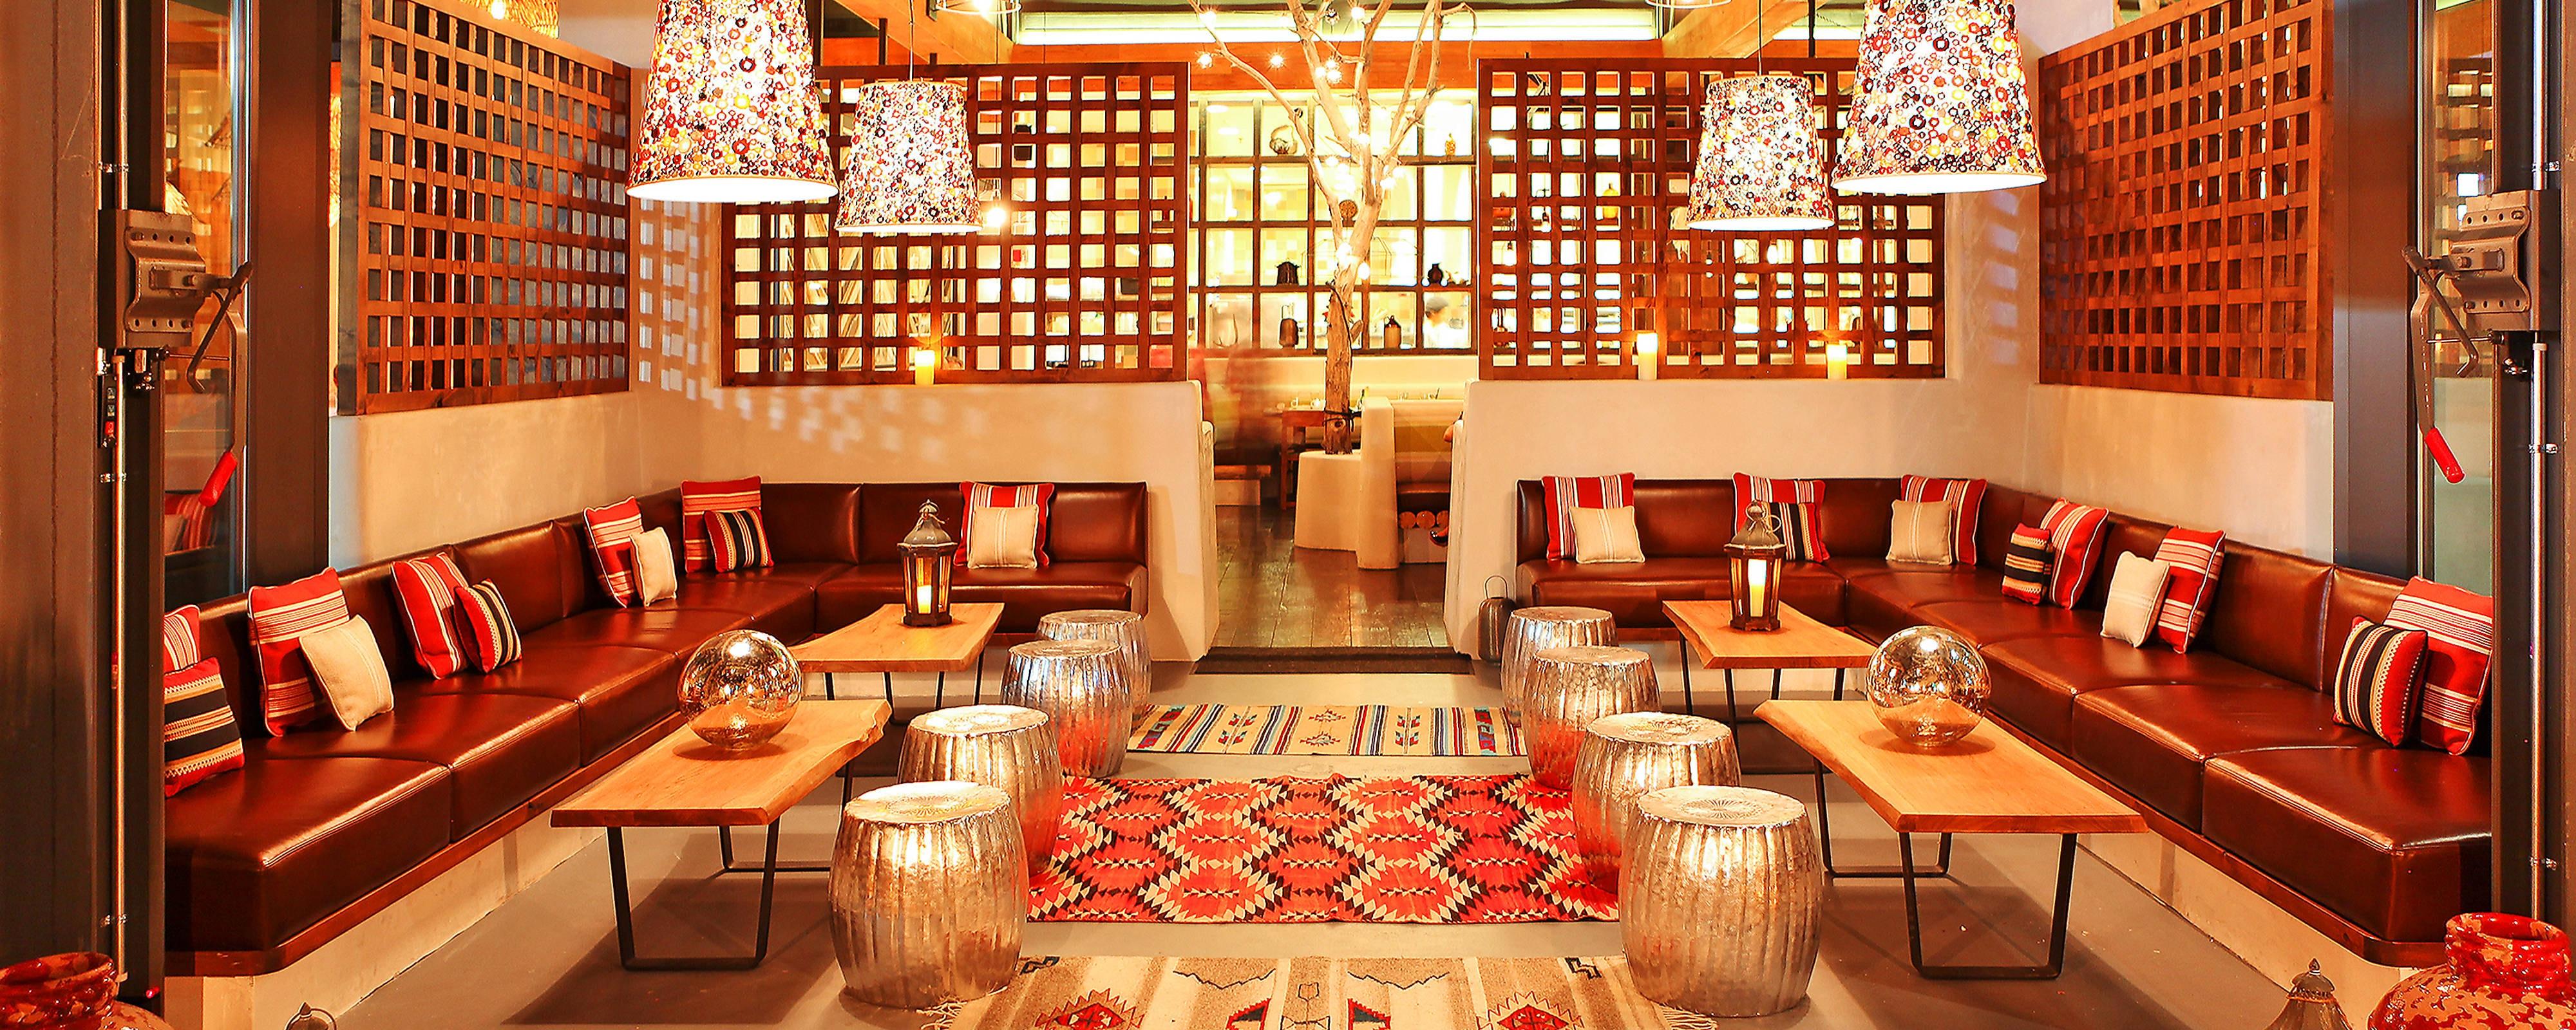 Kachina–Restaurant